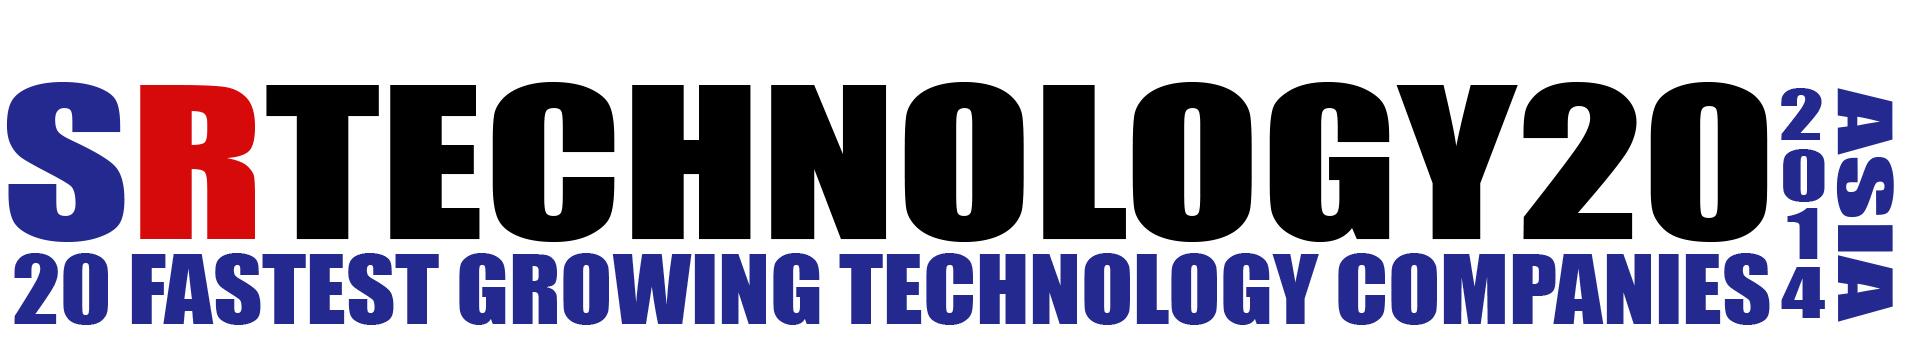 Top 20 Tech Asia Company 2014 Listing